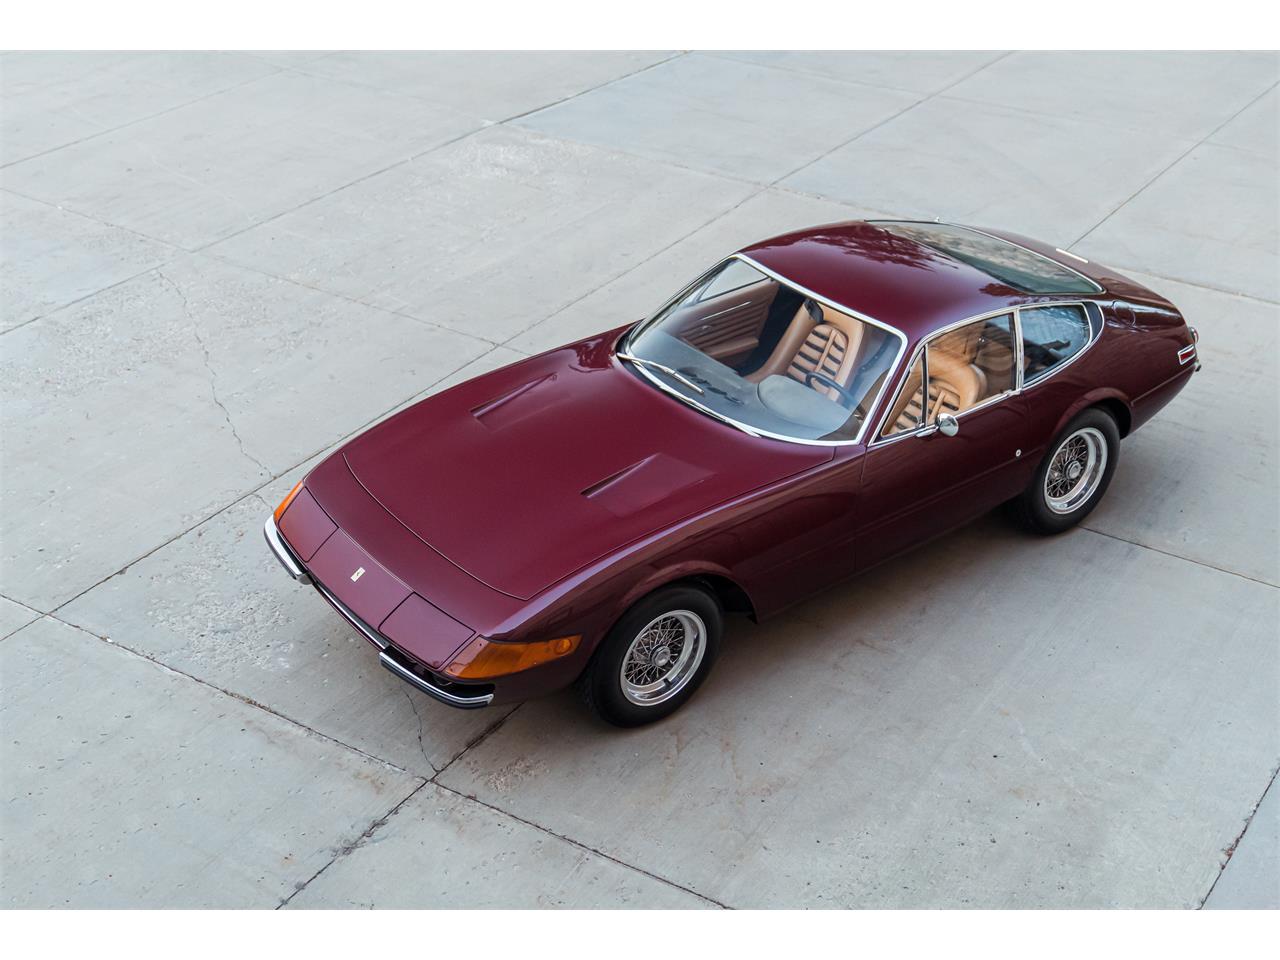 Large Picture of '72 Ferrari 365 GTB/4 Daytona located in Pontiac Michigan - $725,000.00 - QL32